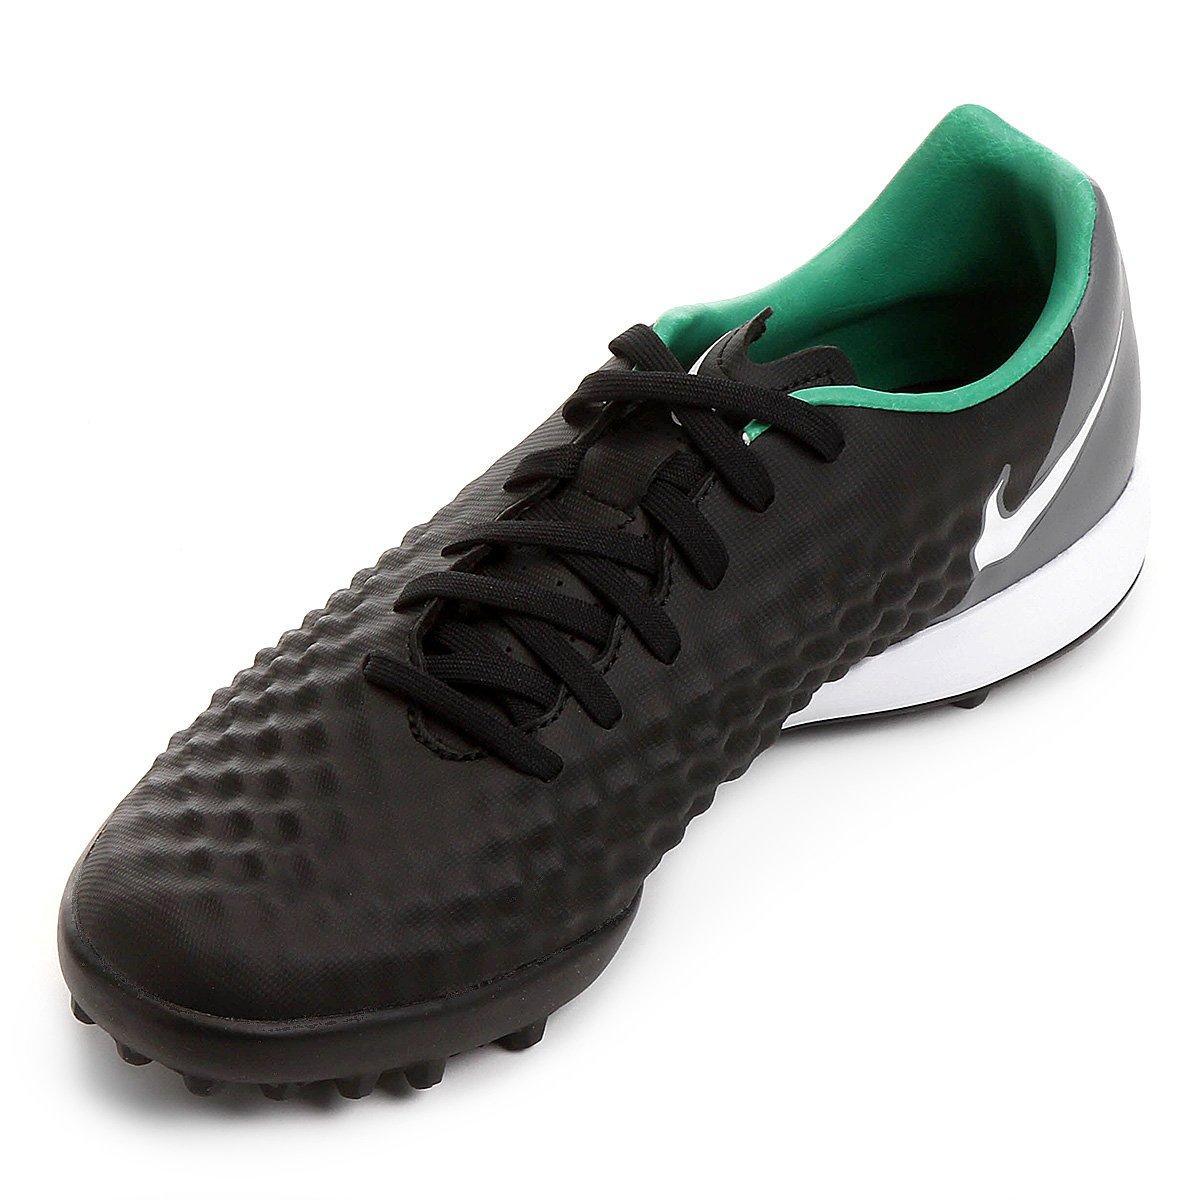 Chuteira Society Nike Magista Onda II TF - Preto e verde - Compre ... 6be8500cd5892